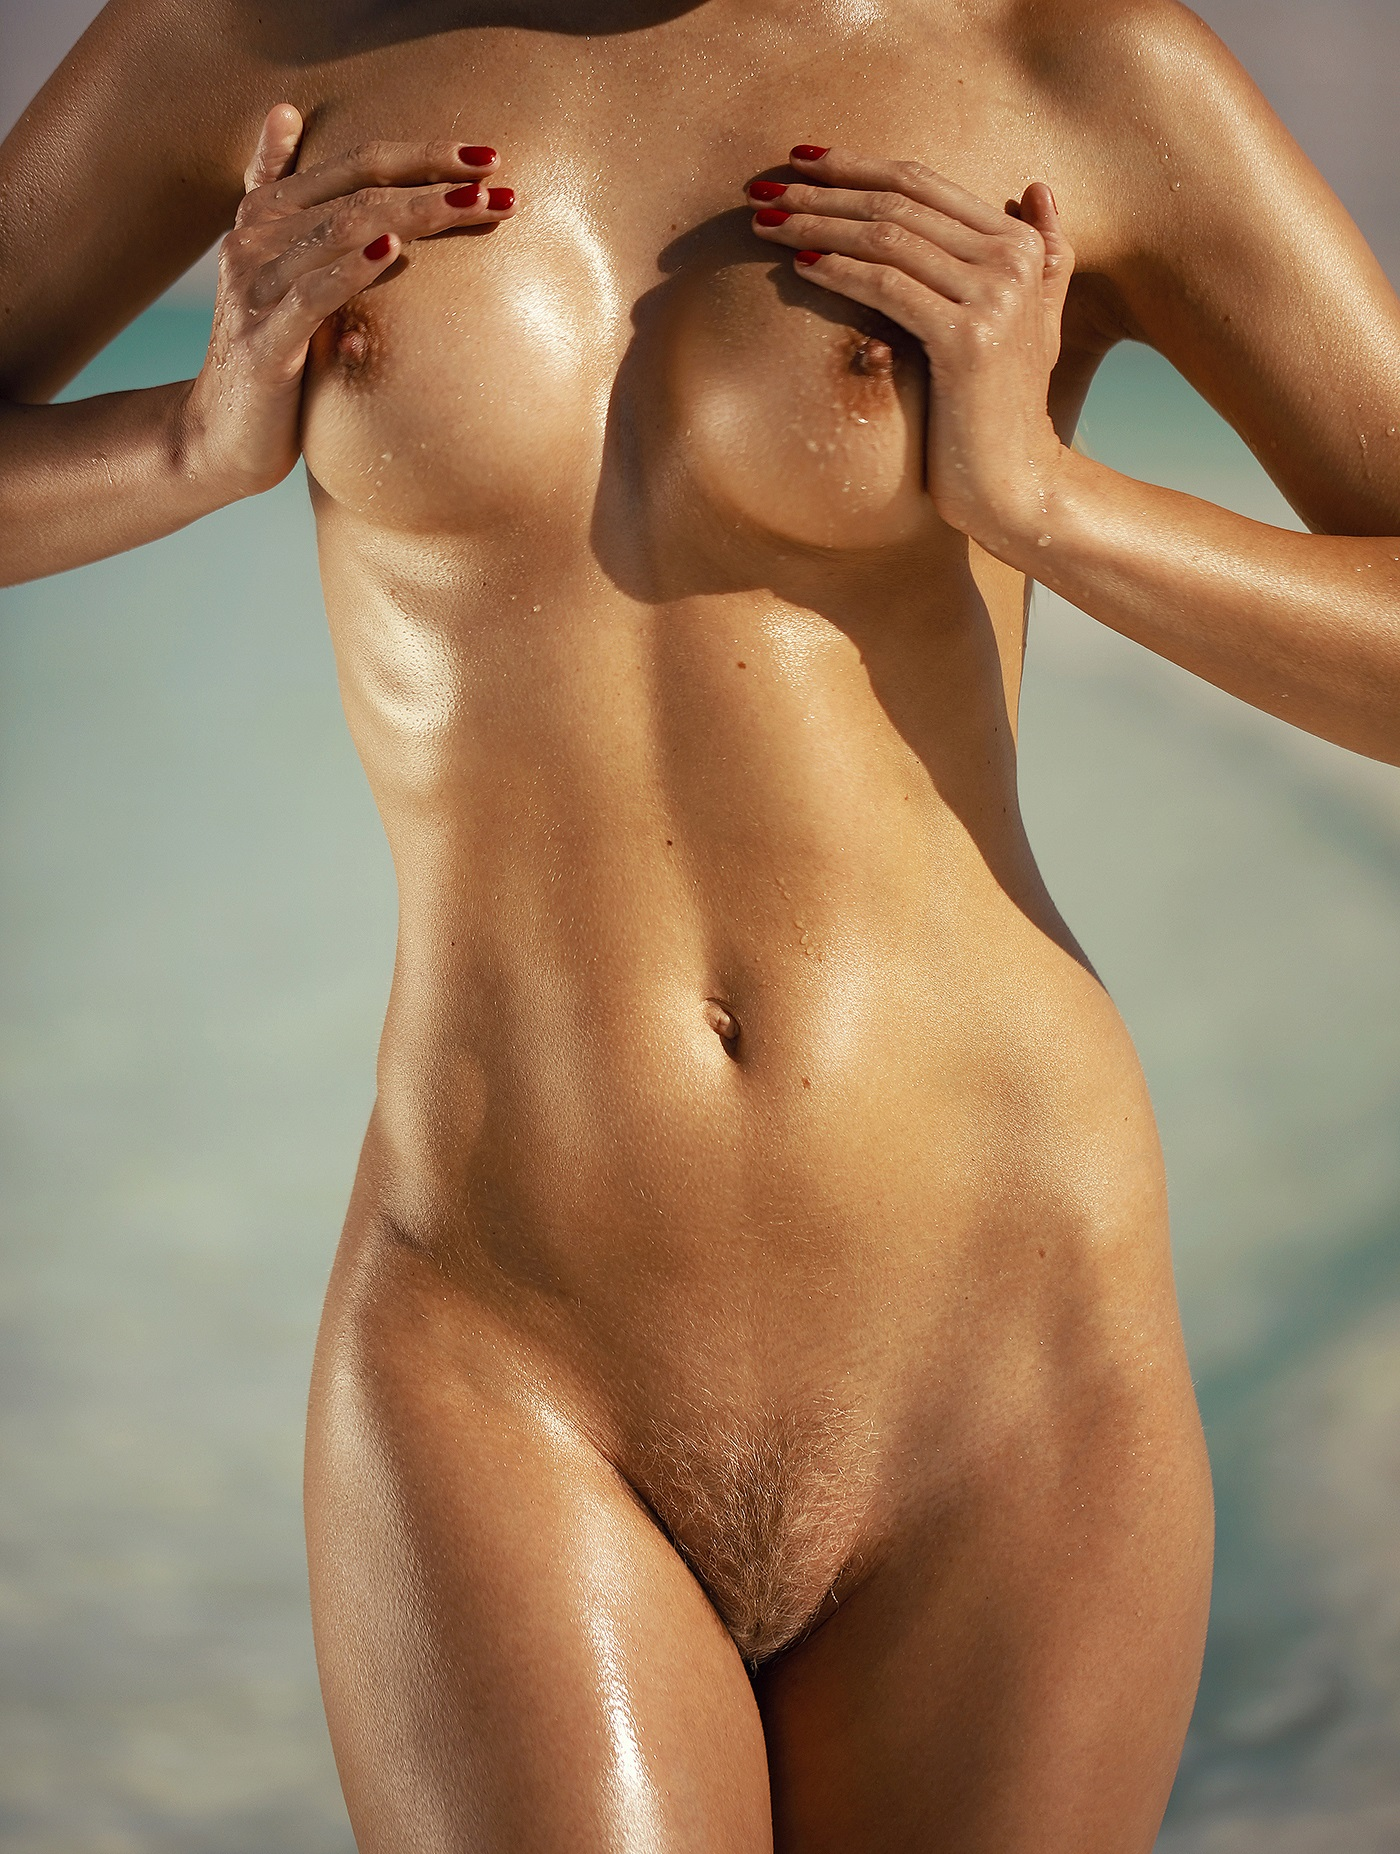 Dasha Snezhnaya - Ana Dias (Playboy) photoshoot